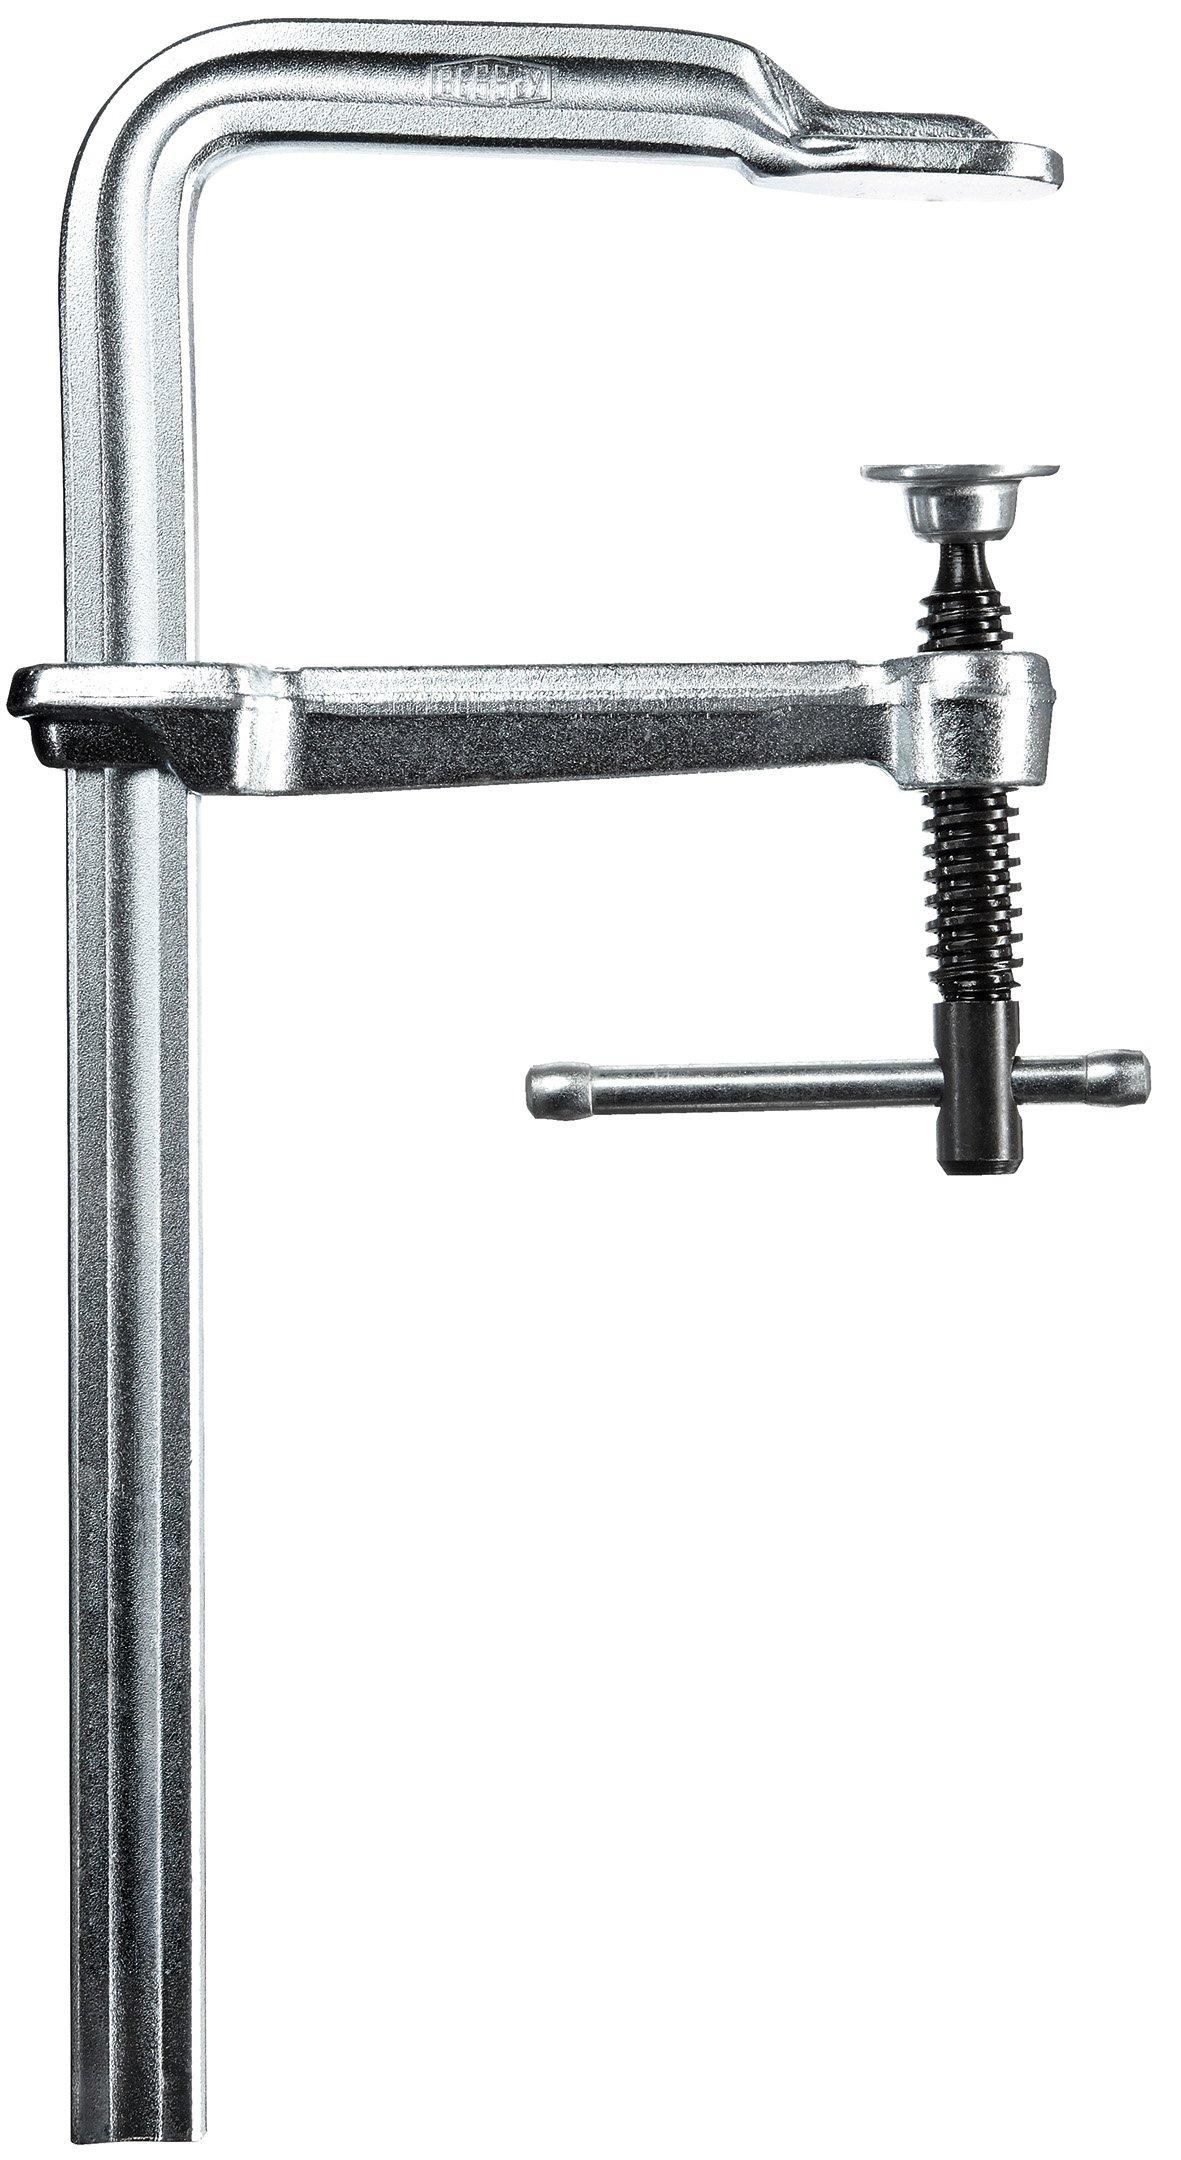 Bessey GS25K Screw Clamp''Classix'' 9.84In/4.72In of Steel, Silver